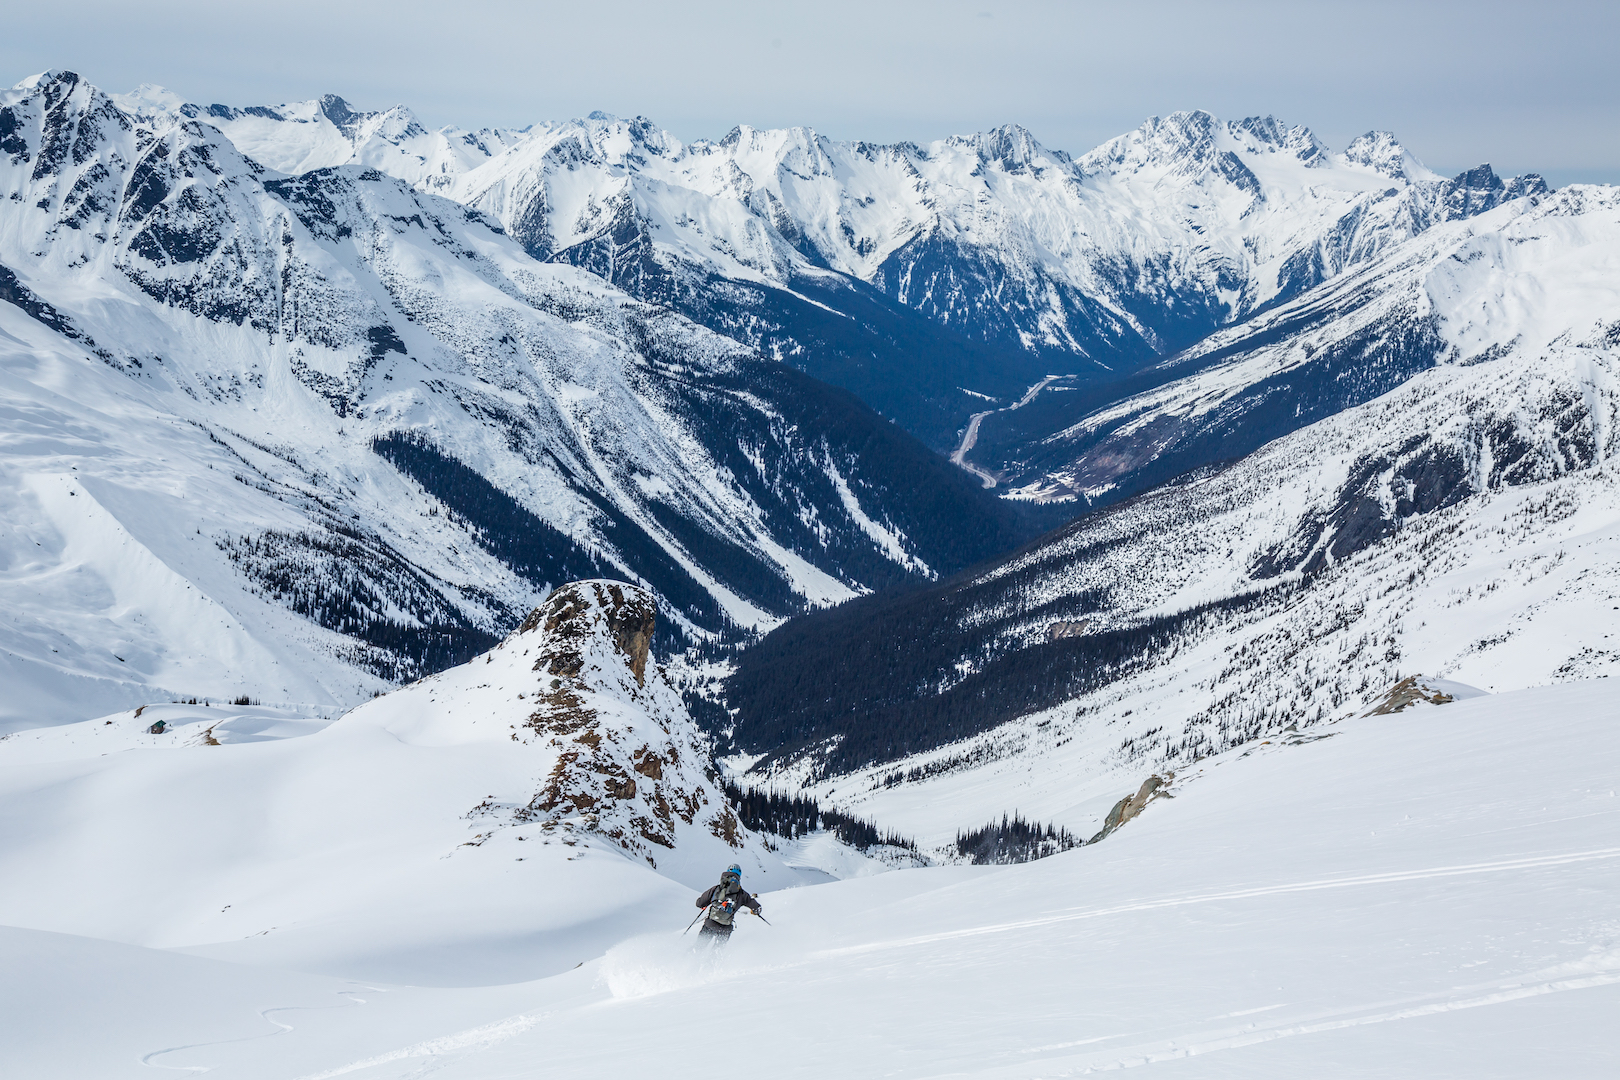 person skiing into mountains snow